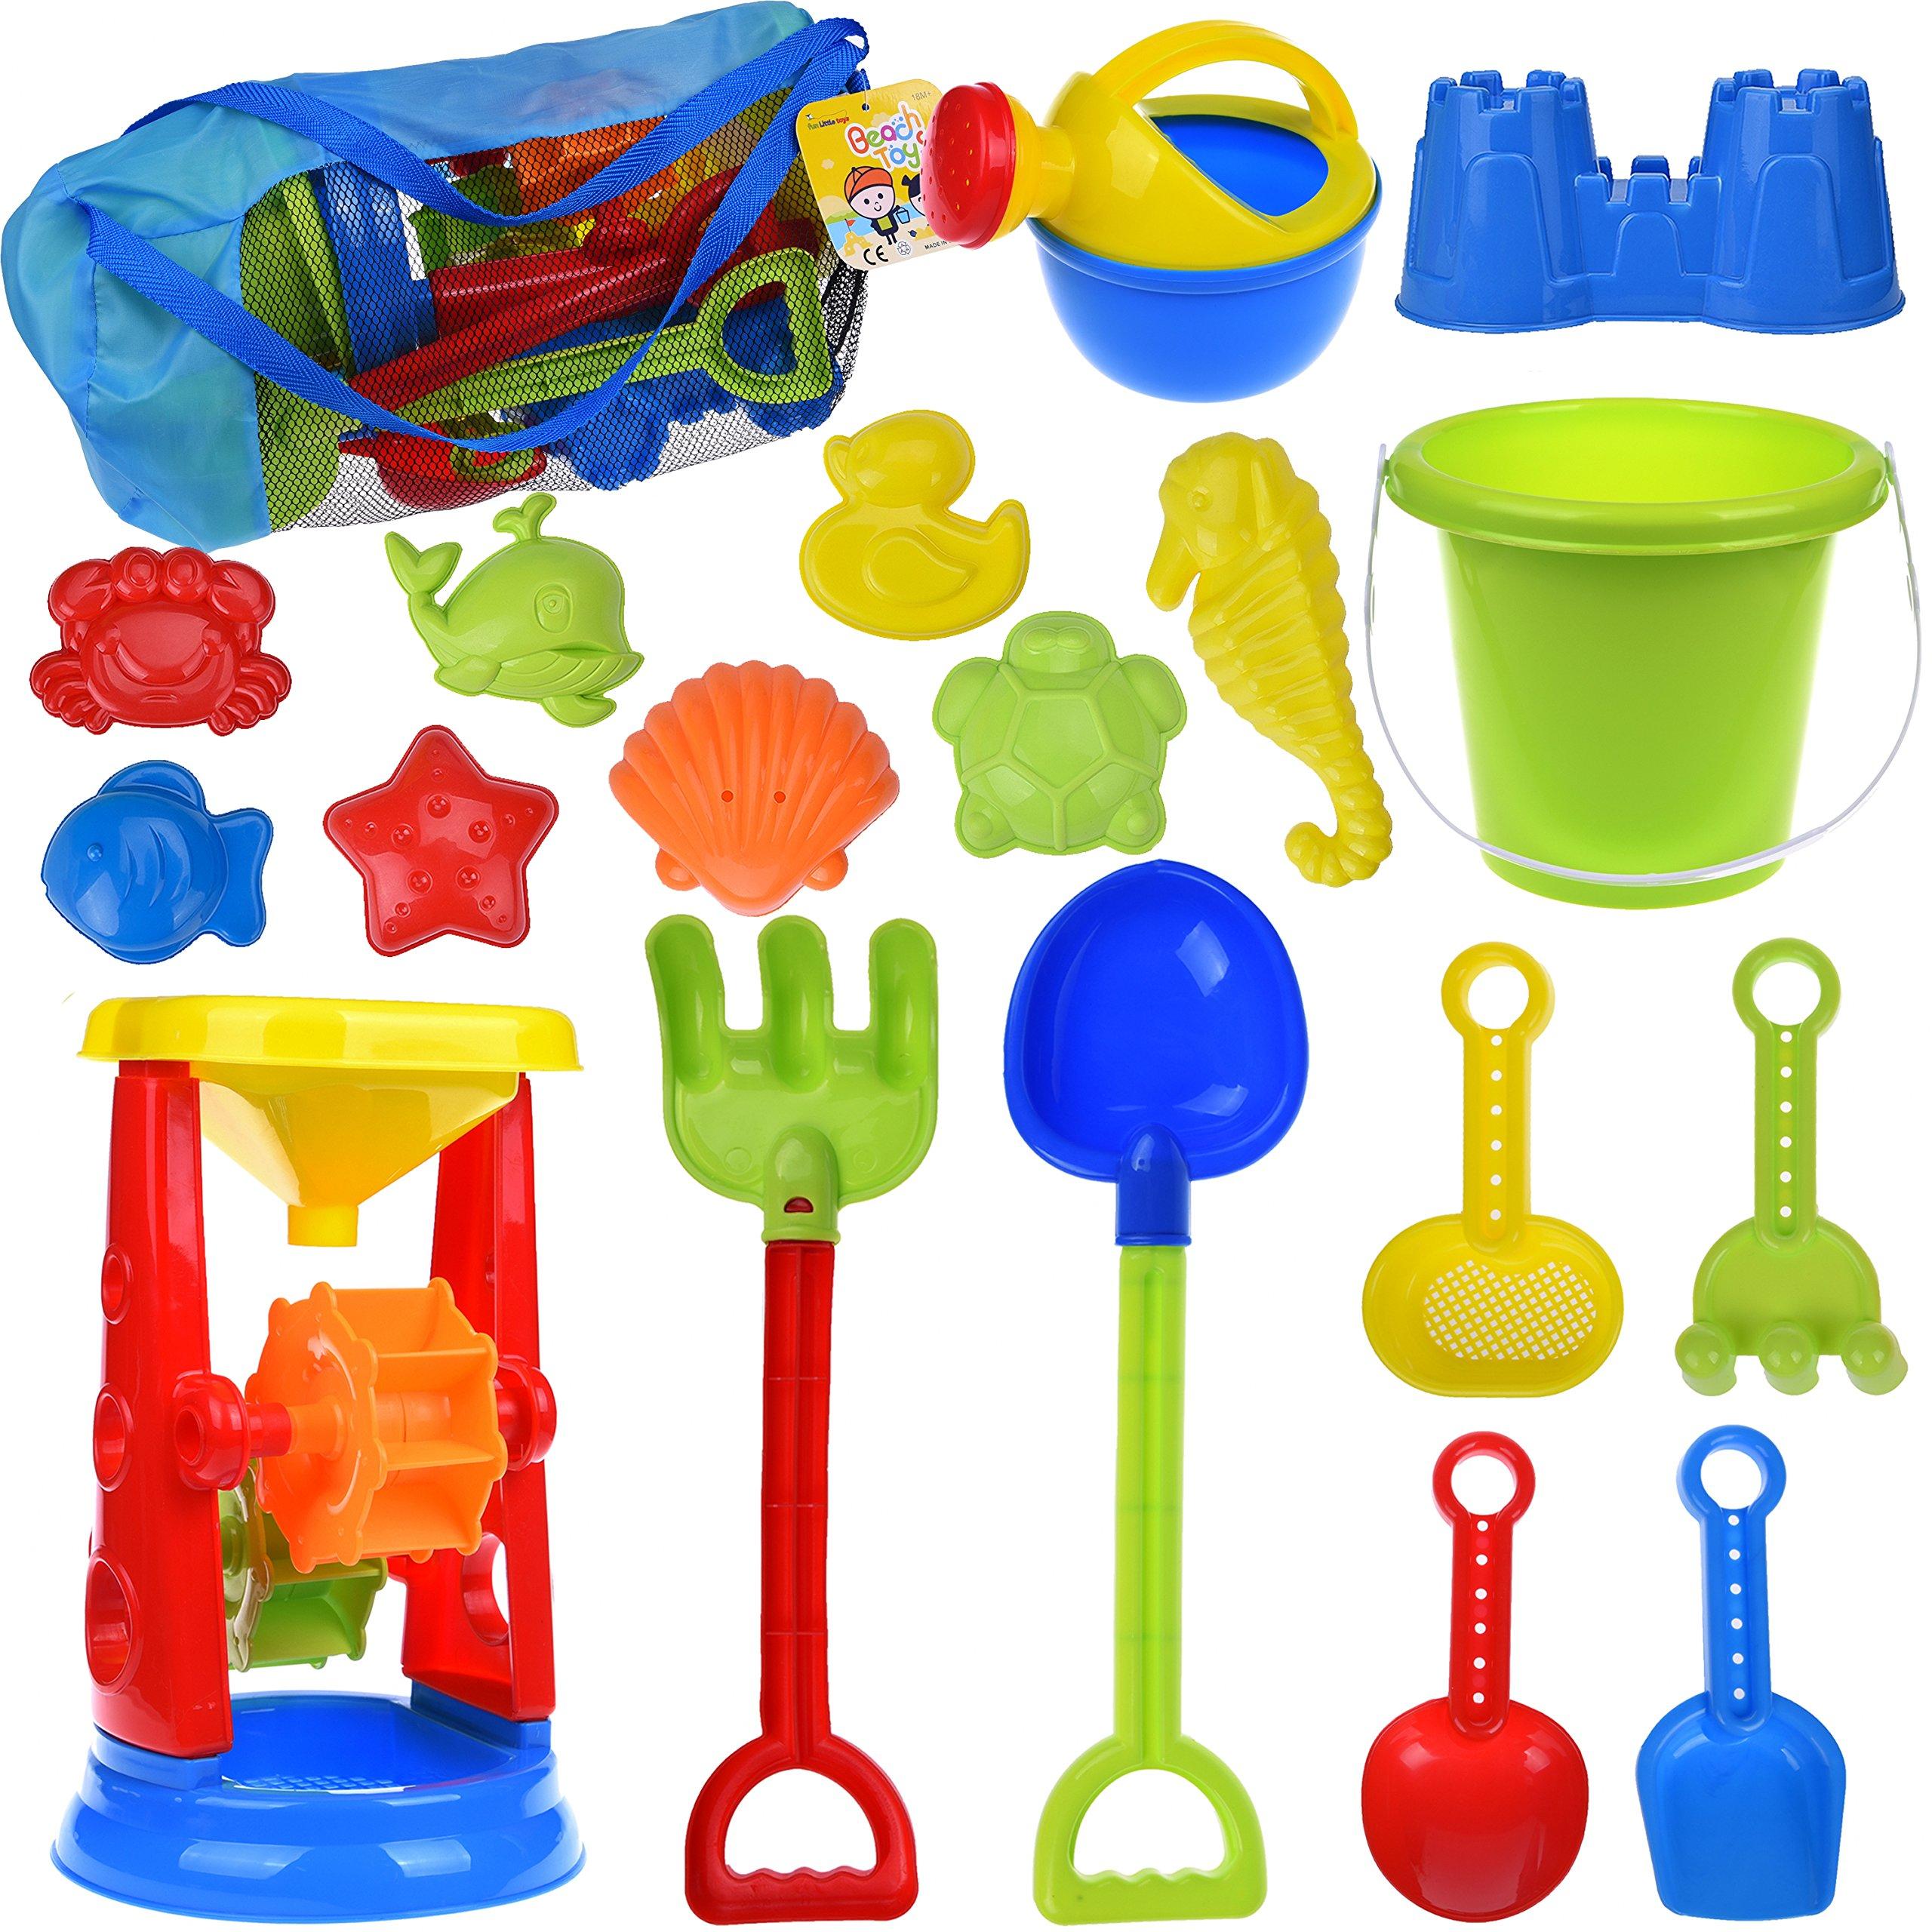 19 PCs Kids Beach Sand Toys Set with Sand Water Wheel, Beach Molds, Beach Bucket and Beach Shovel Tool Kit, Sandbox Toys for Toddlers